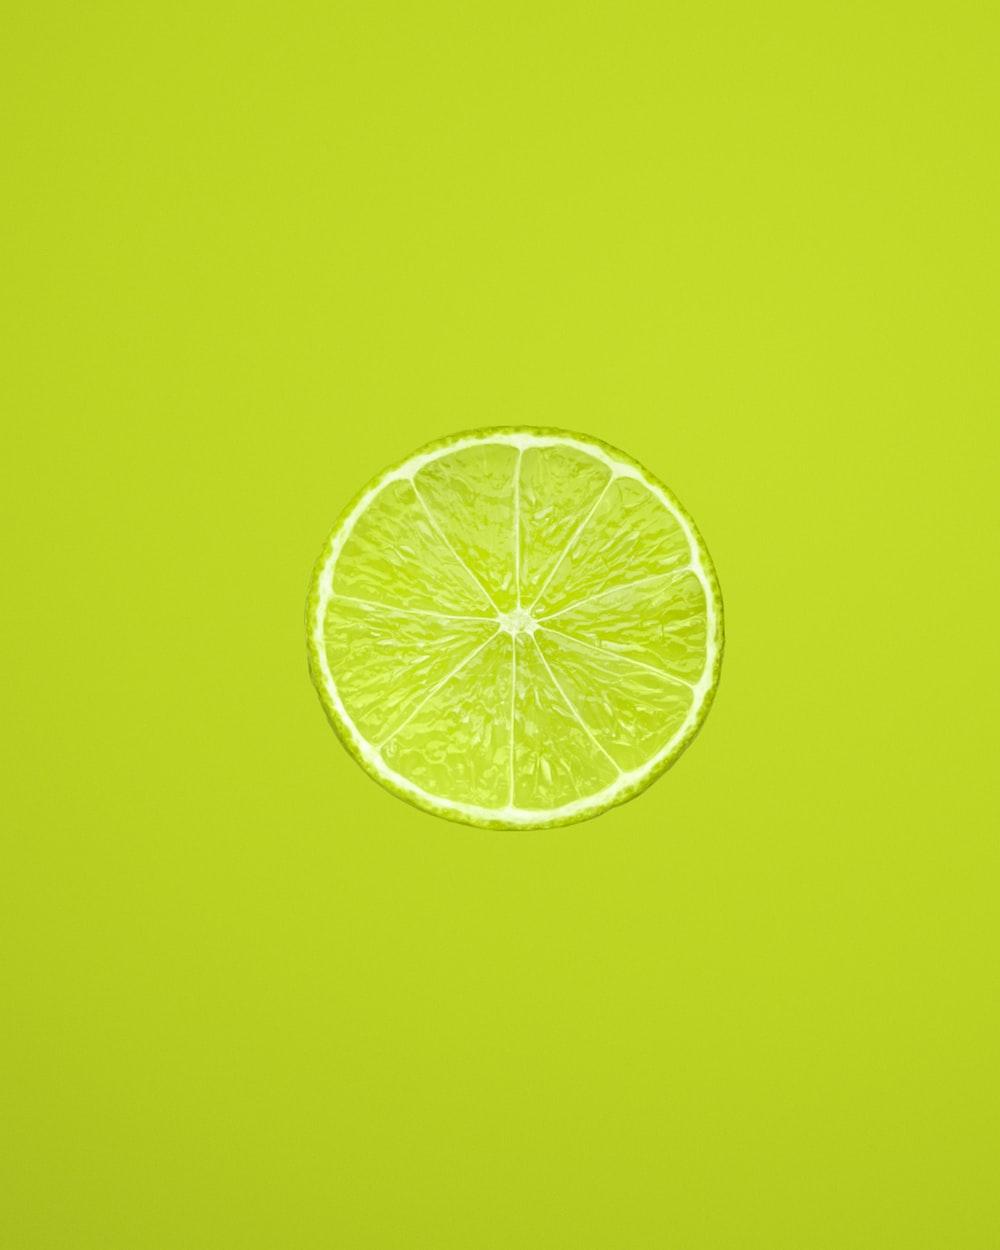 yellow lemon fruit on green background